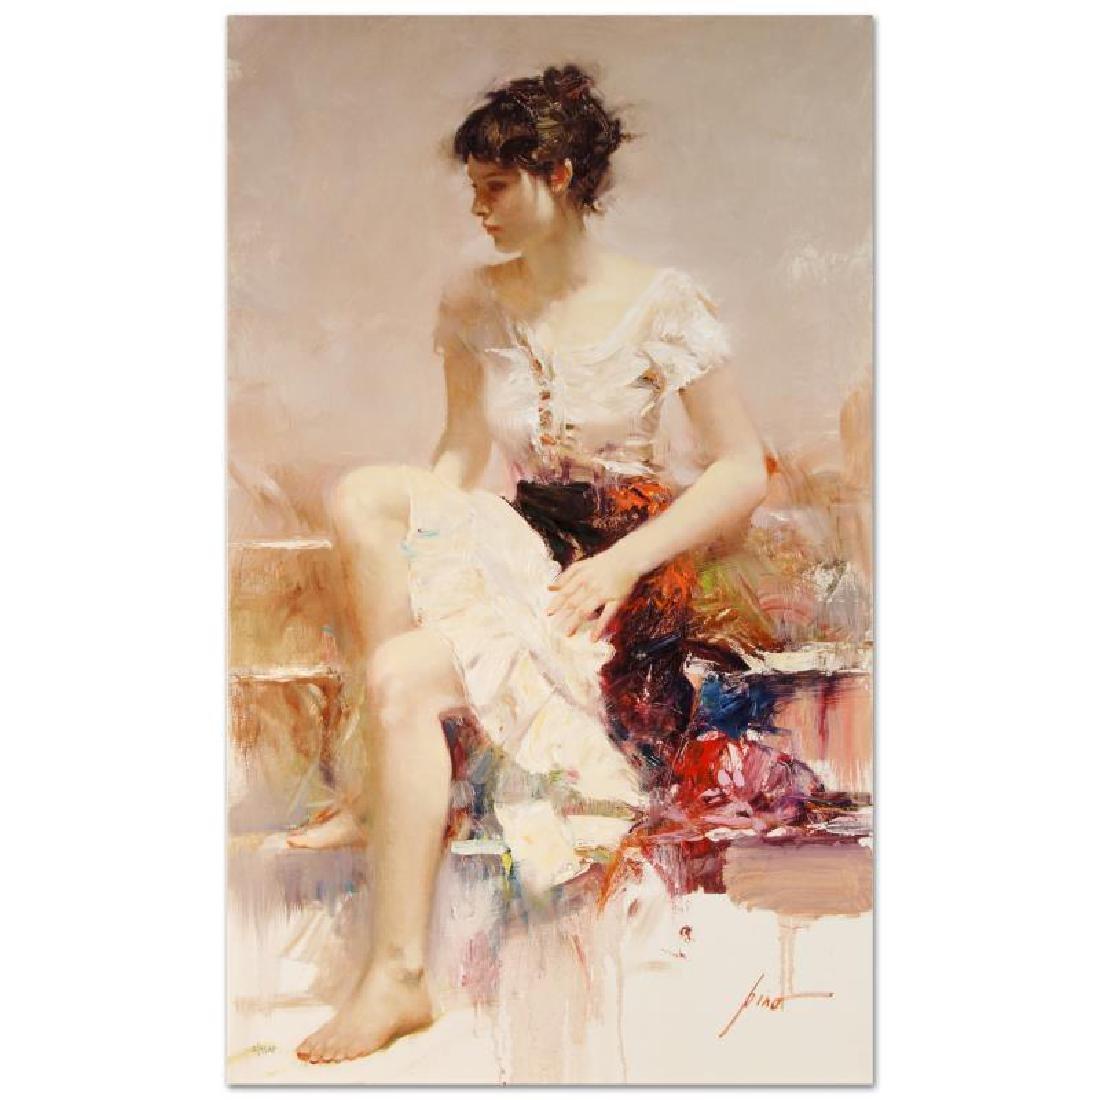 White Lace by Pino (1939-2010)